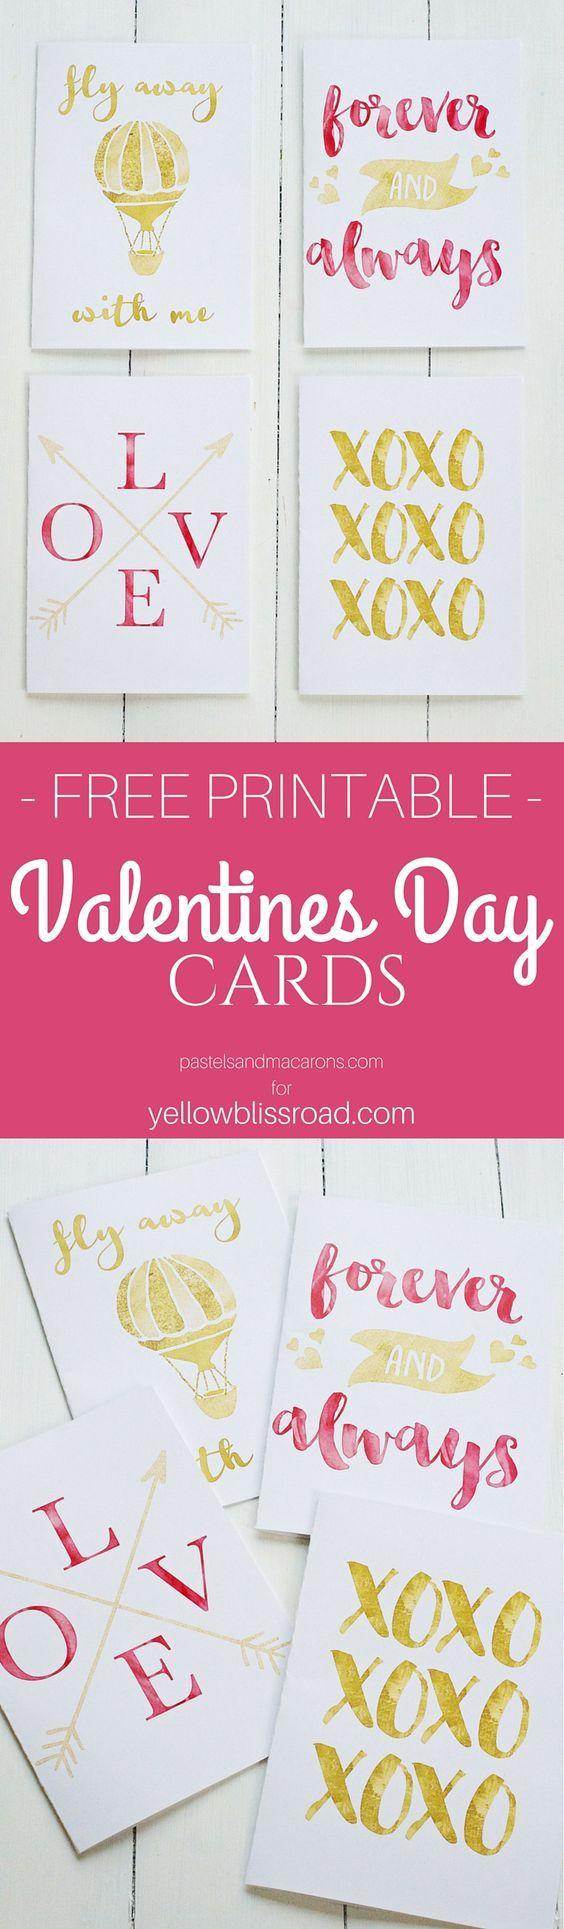 Best 25 Printable valentine cards ideas on Pinterest  Free